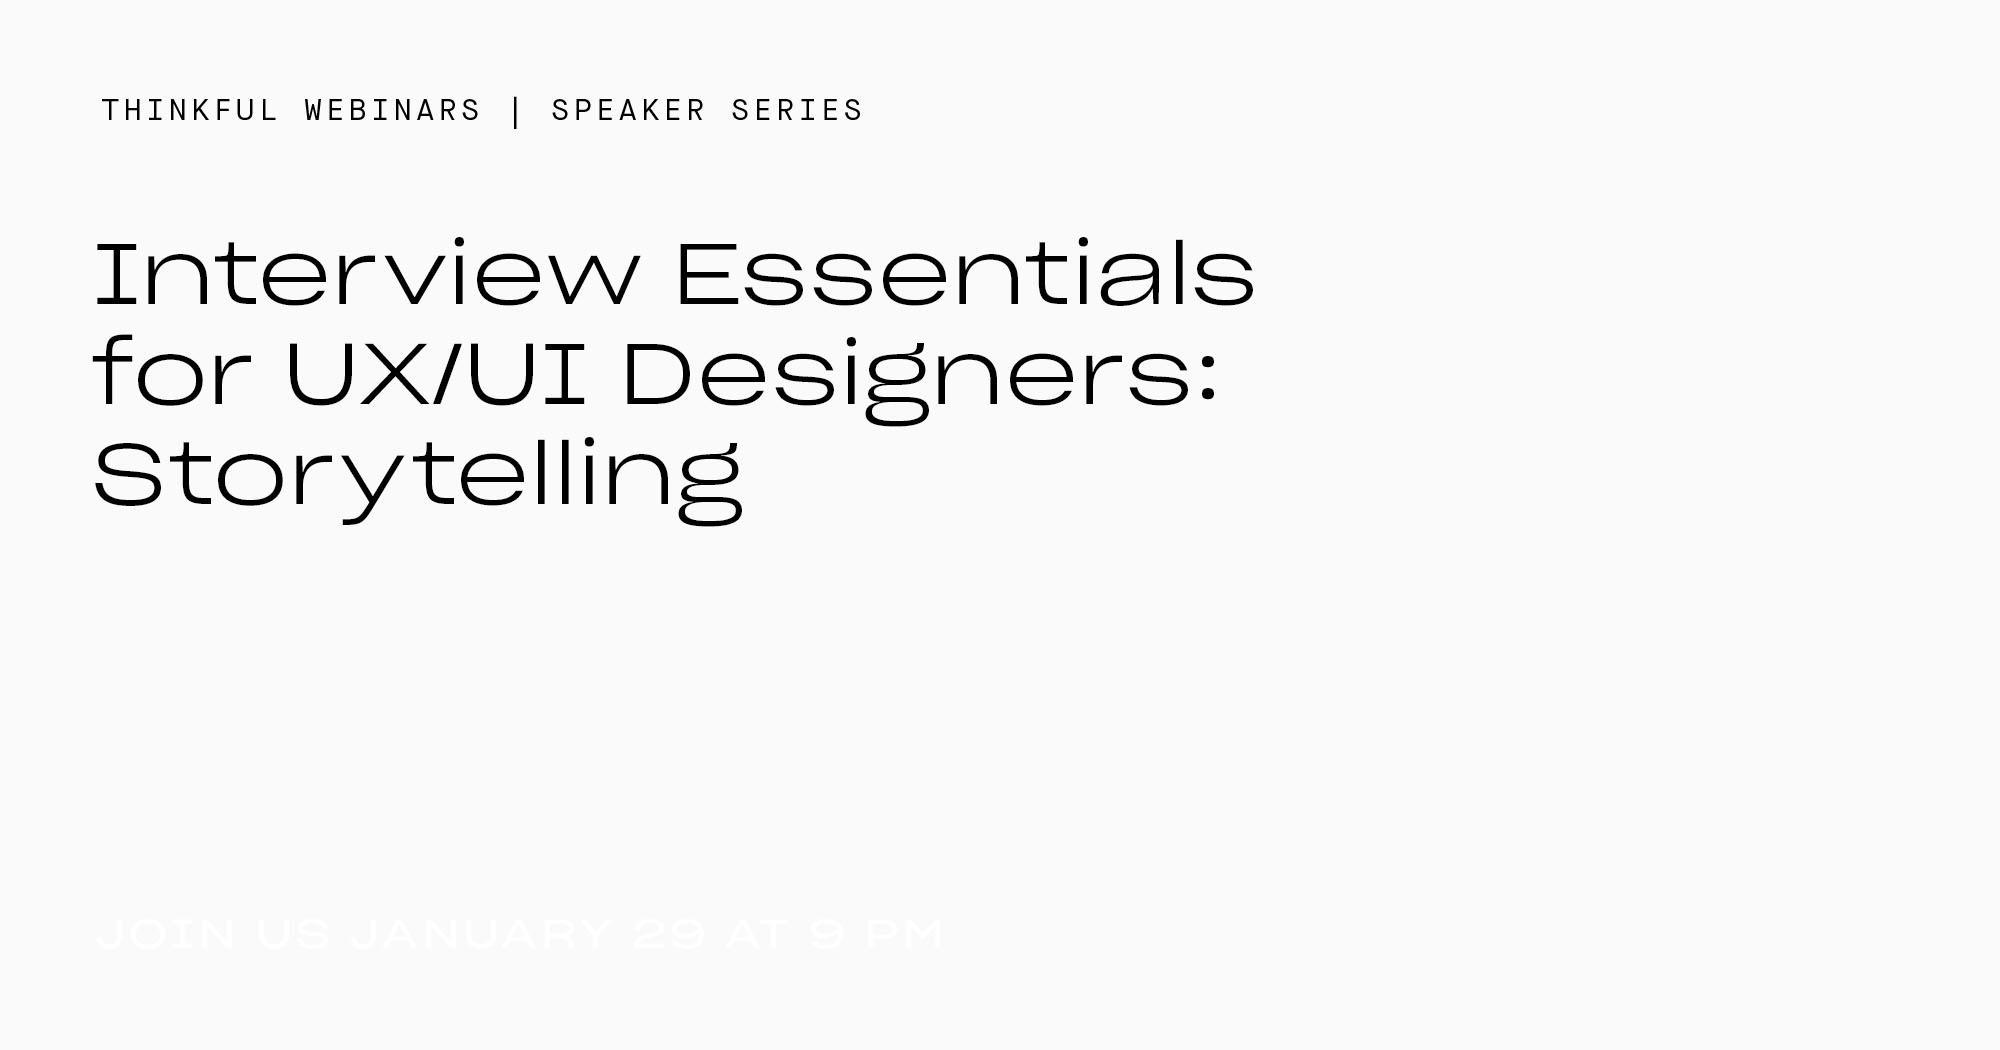 Thinkful Speaker Series || Interview Essentials for UX/UI Designers